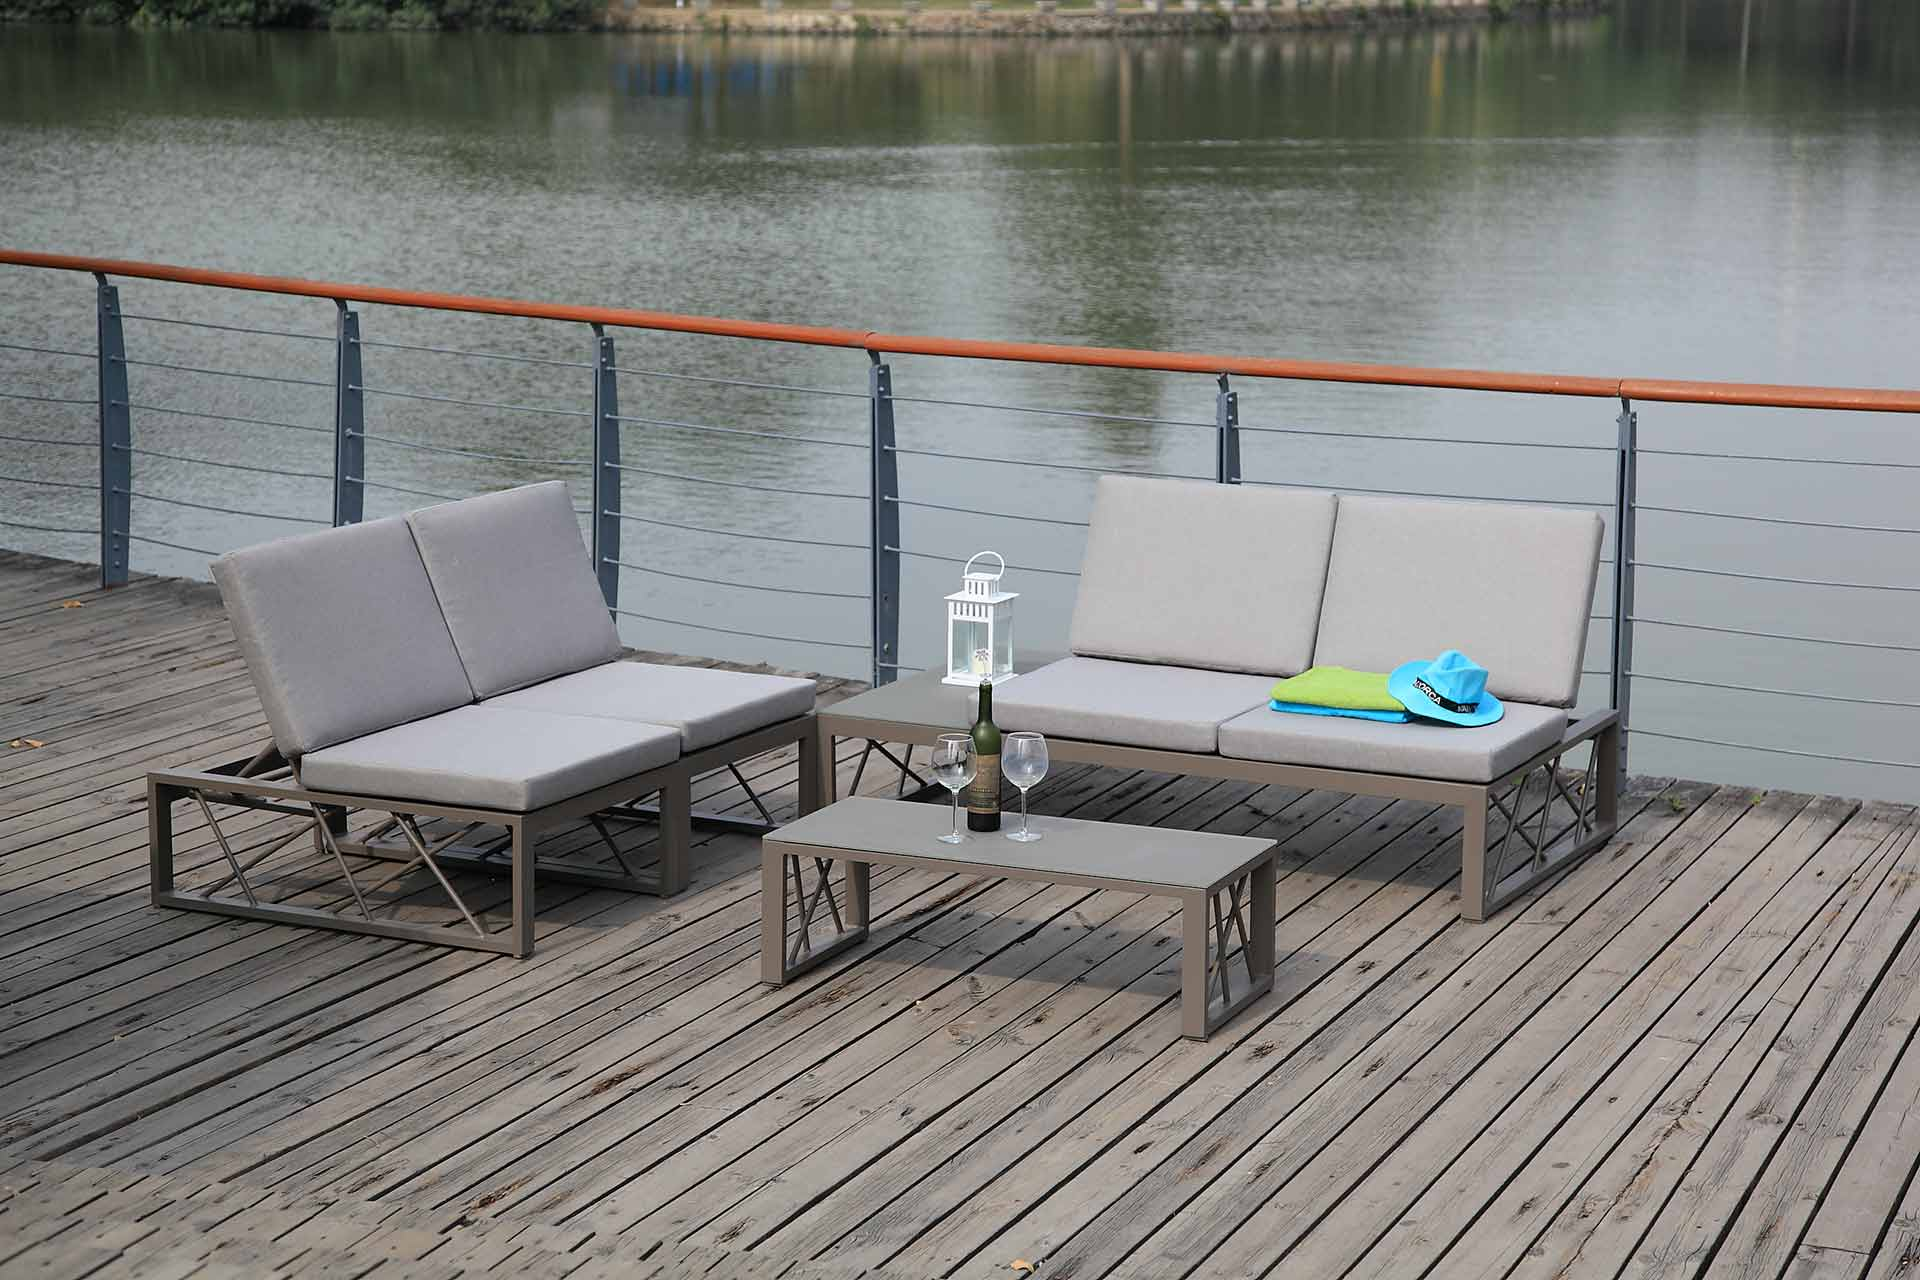 gartenm bel von zebra ziegeler outdoor living. Black Bedroom Furniture Sets. Home Design Ideas